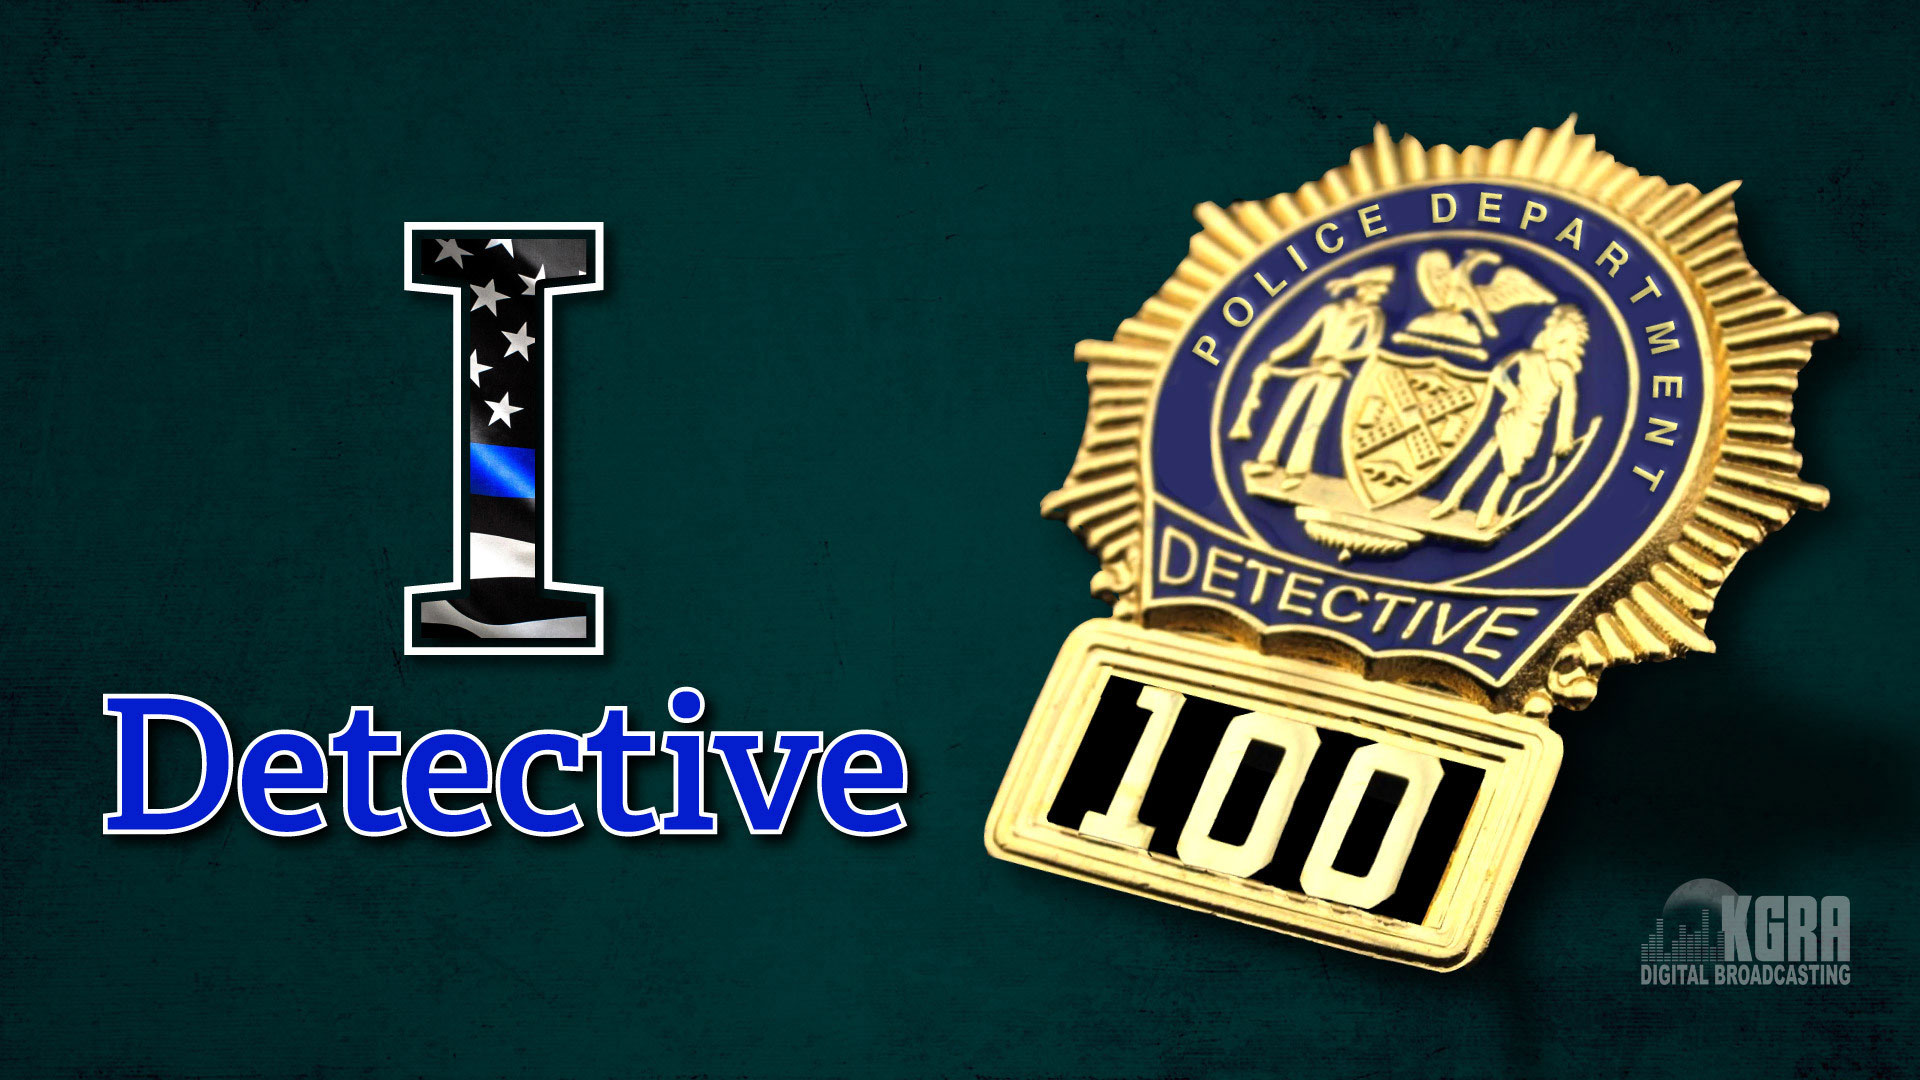 I Detective Show